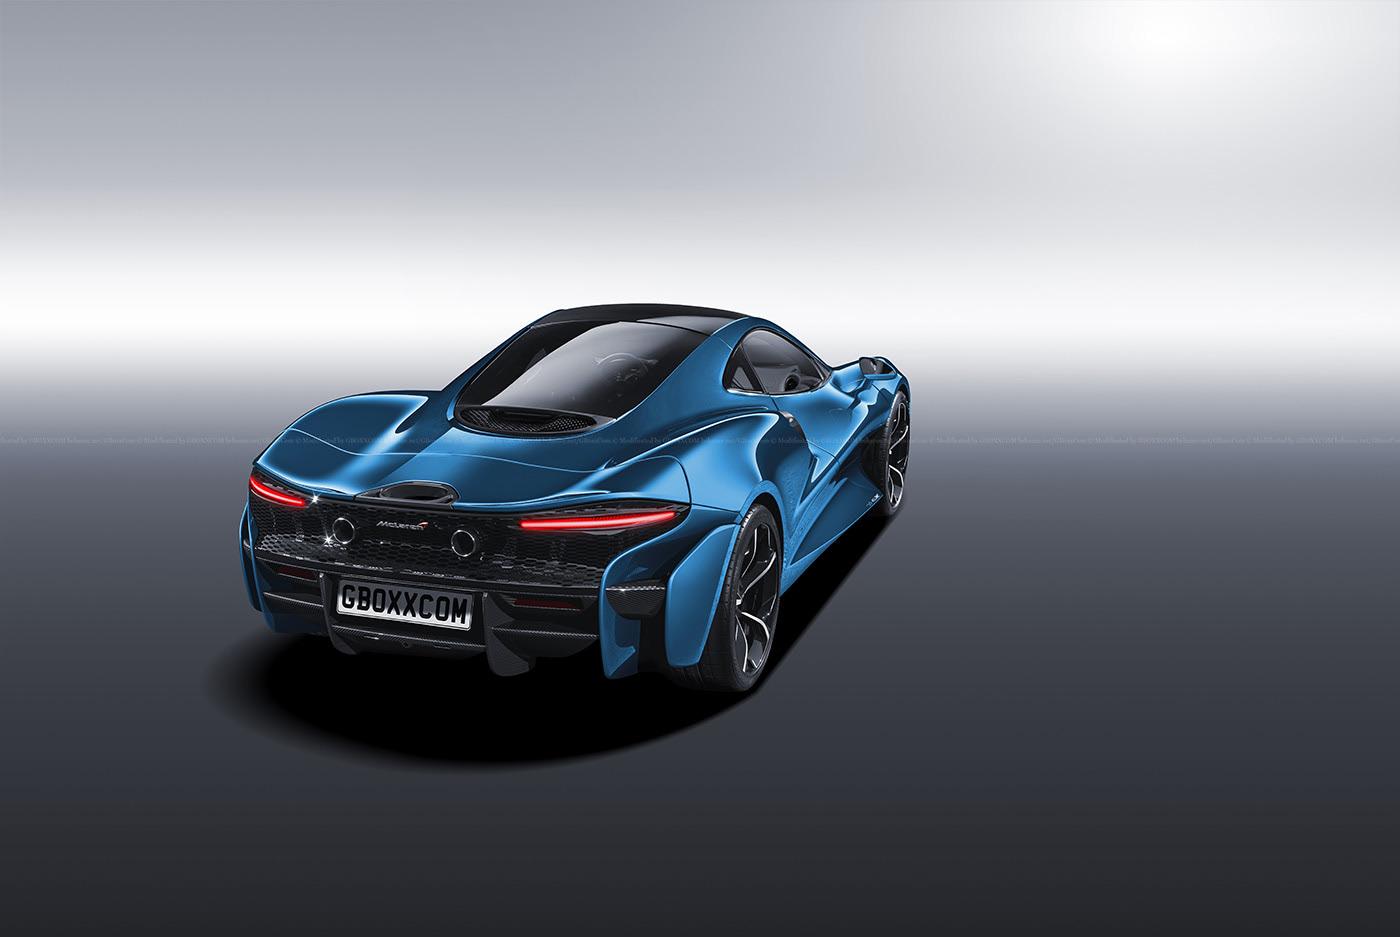 2020-McLaren-Elva-Coupe-2